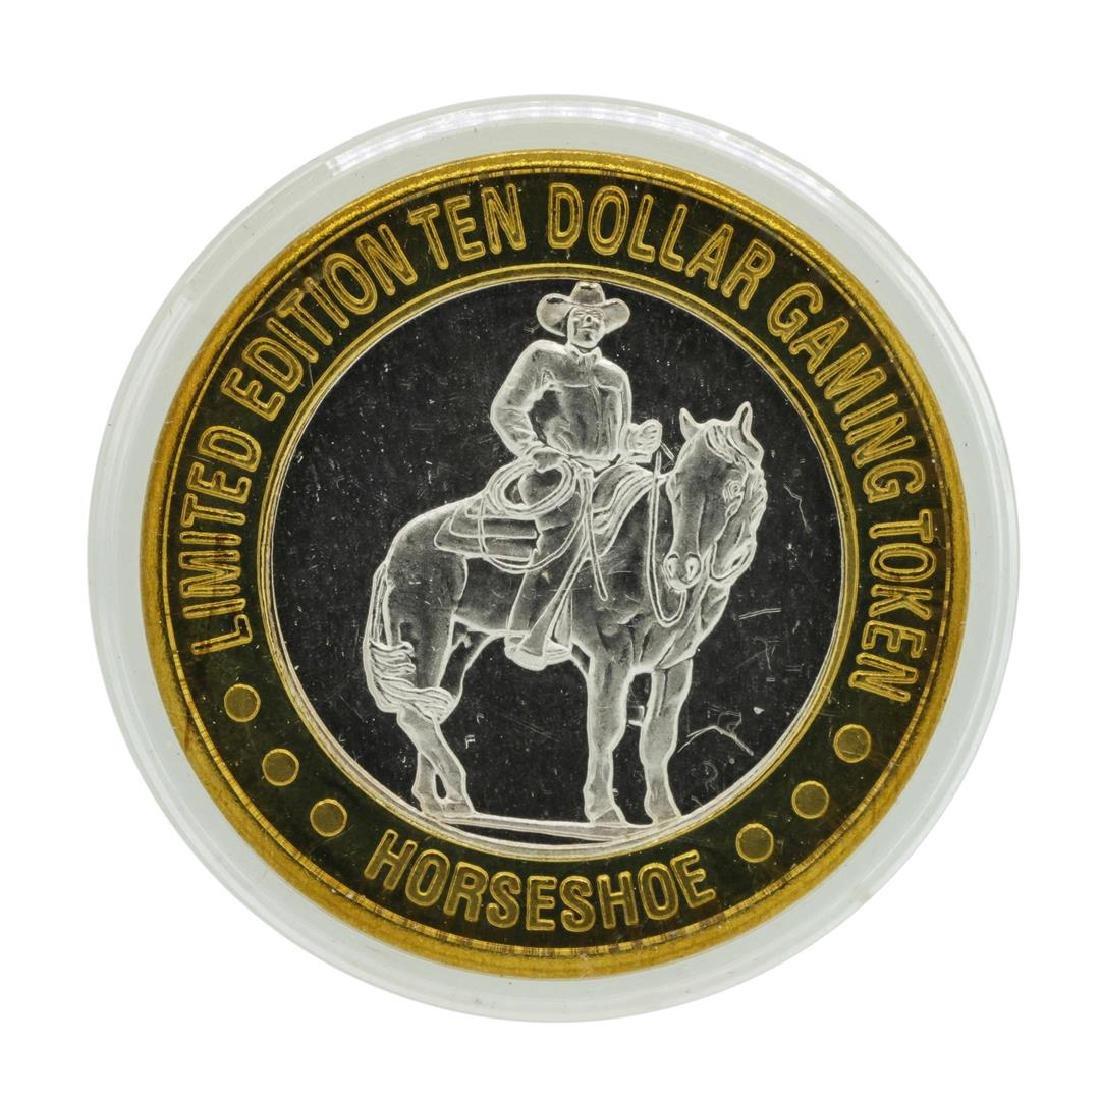 .999 Silver Binion's Horseshoe Las Vegas, NV $10 Casino